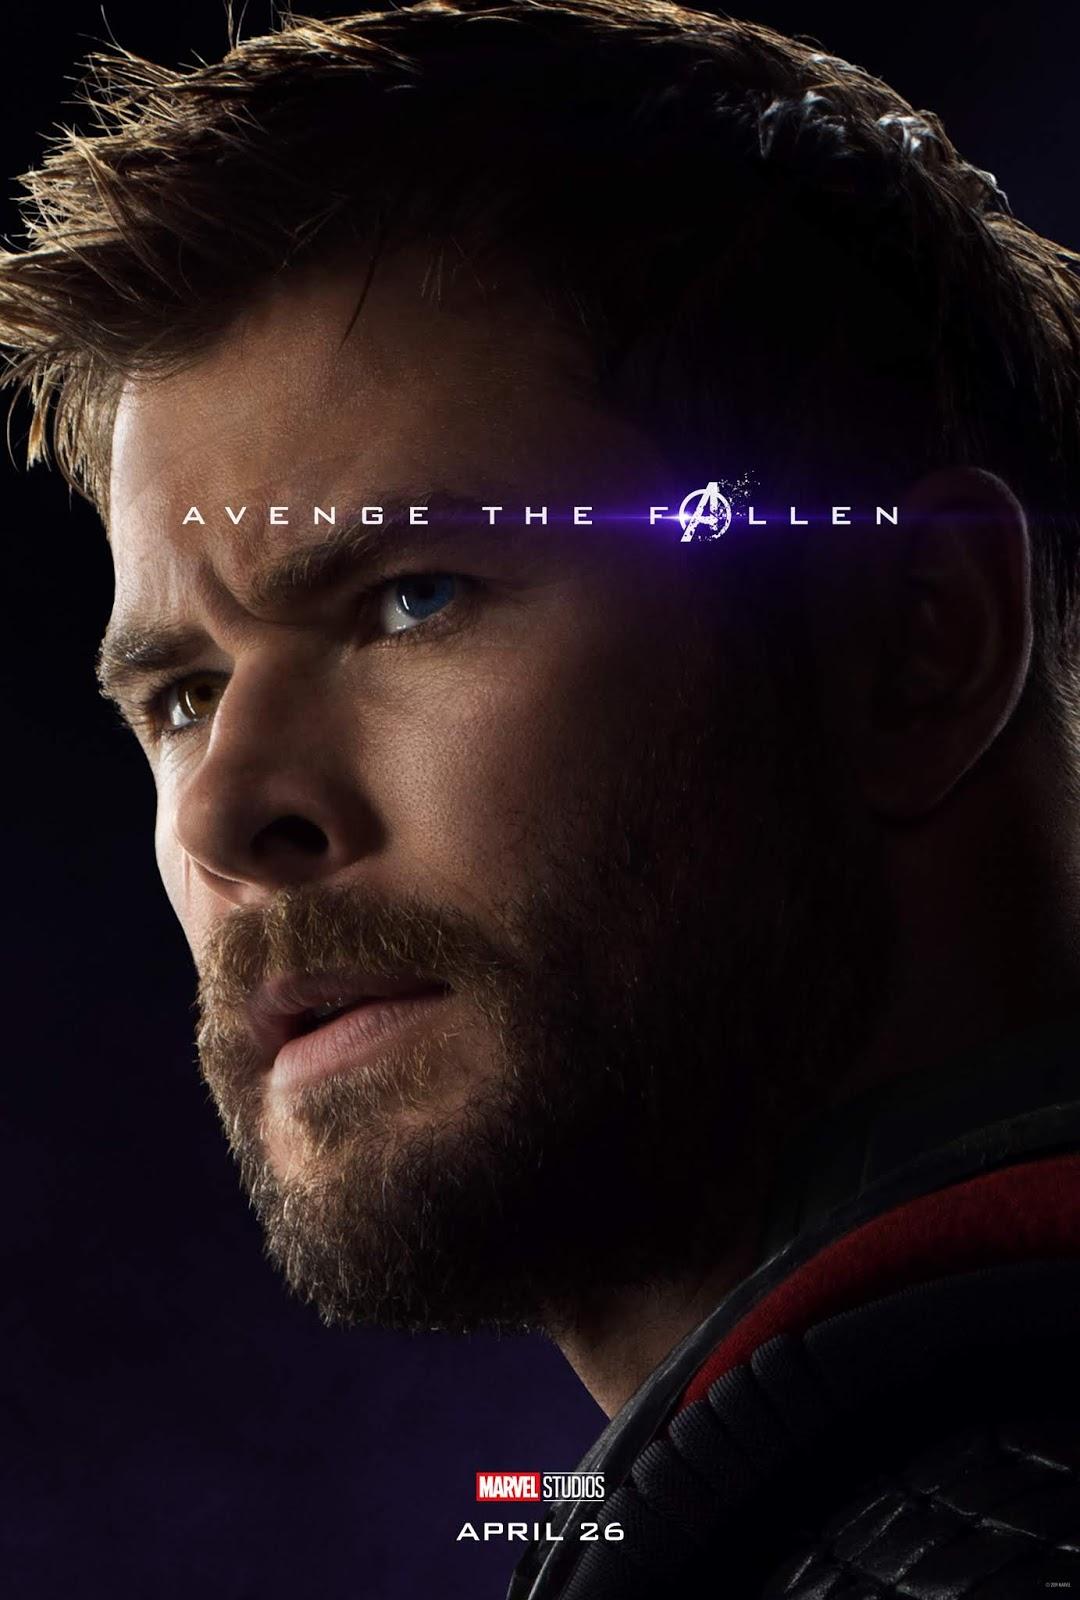 Sasaki Time Avengers Endgame Character Poster For Thor